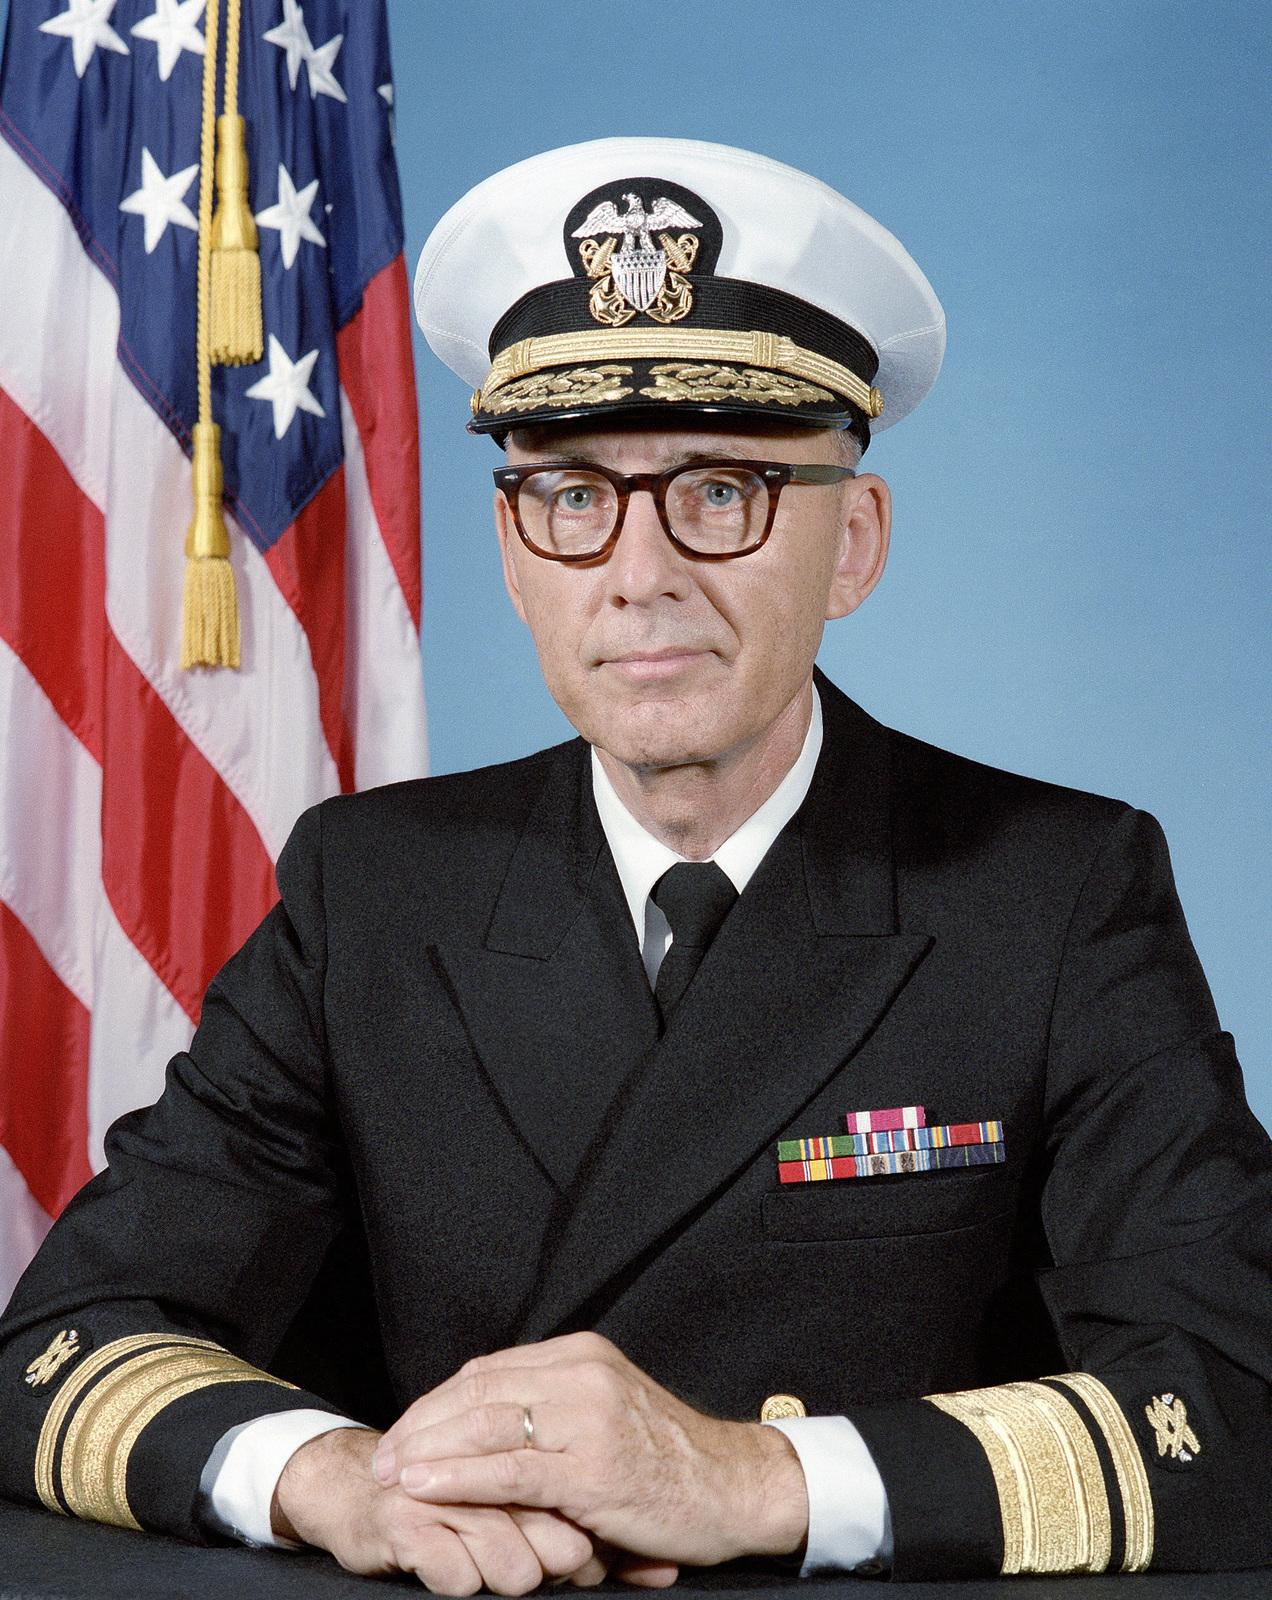 Rear Admiral (RADM) (upper half) Charles R. Smith, USN (covered)